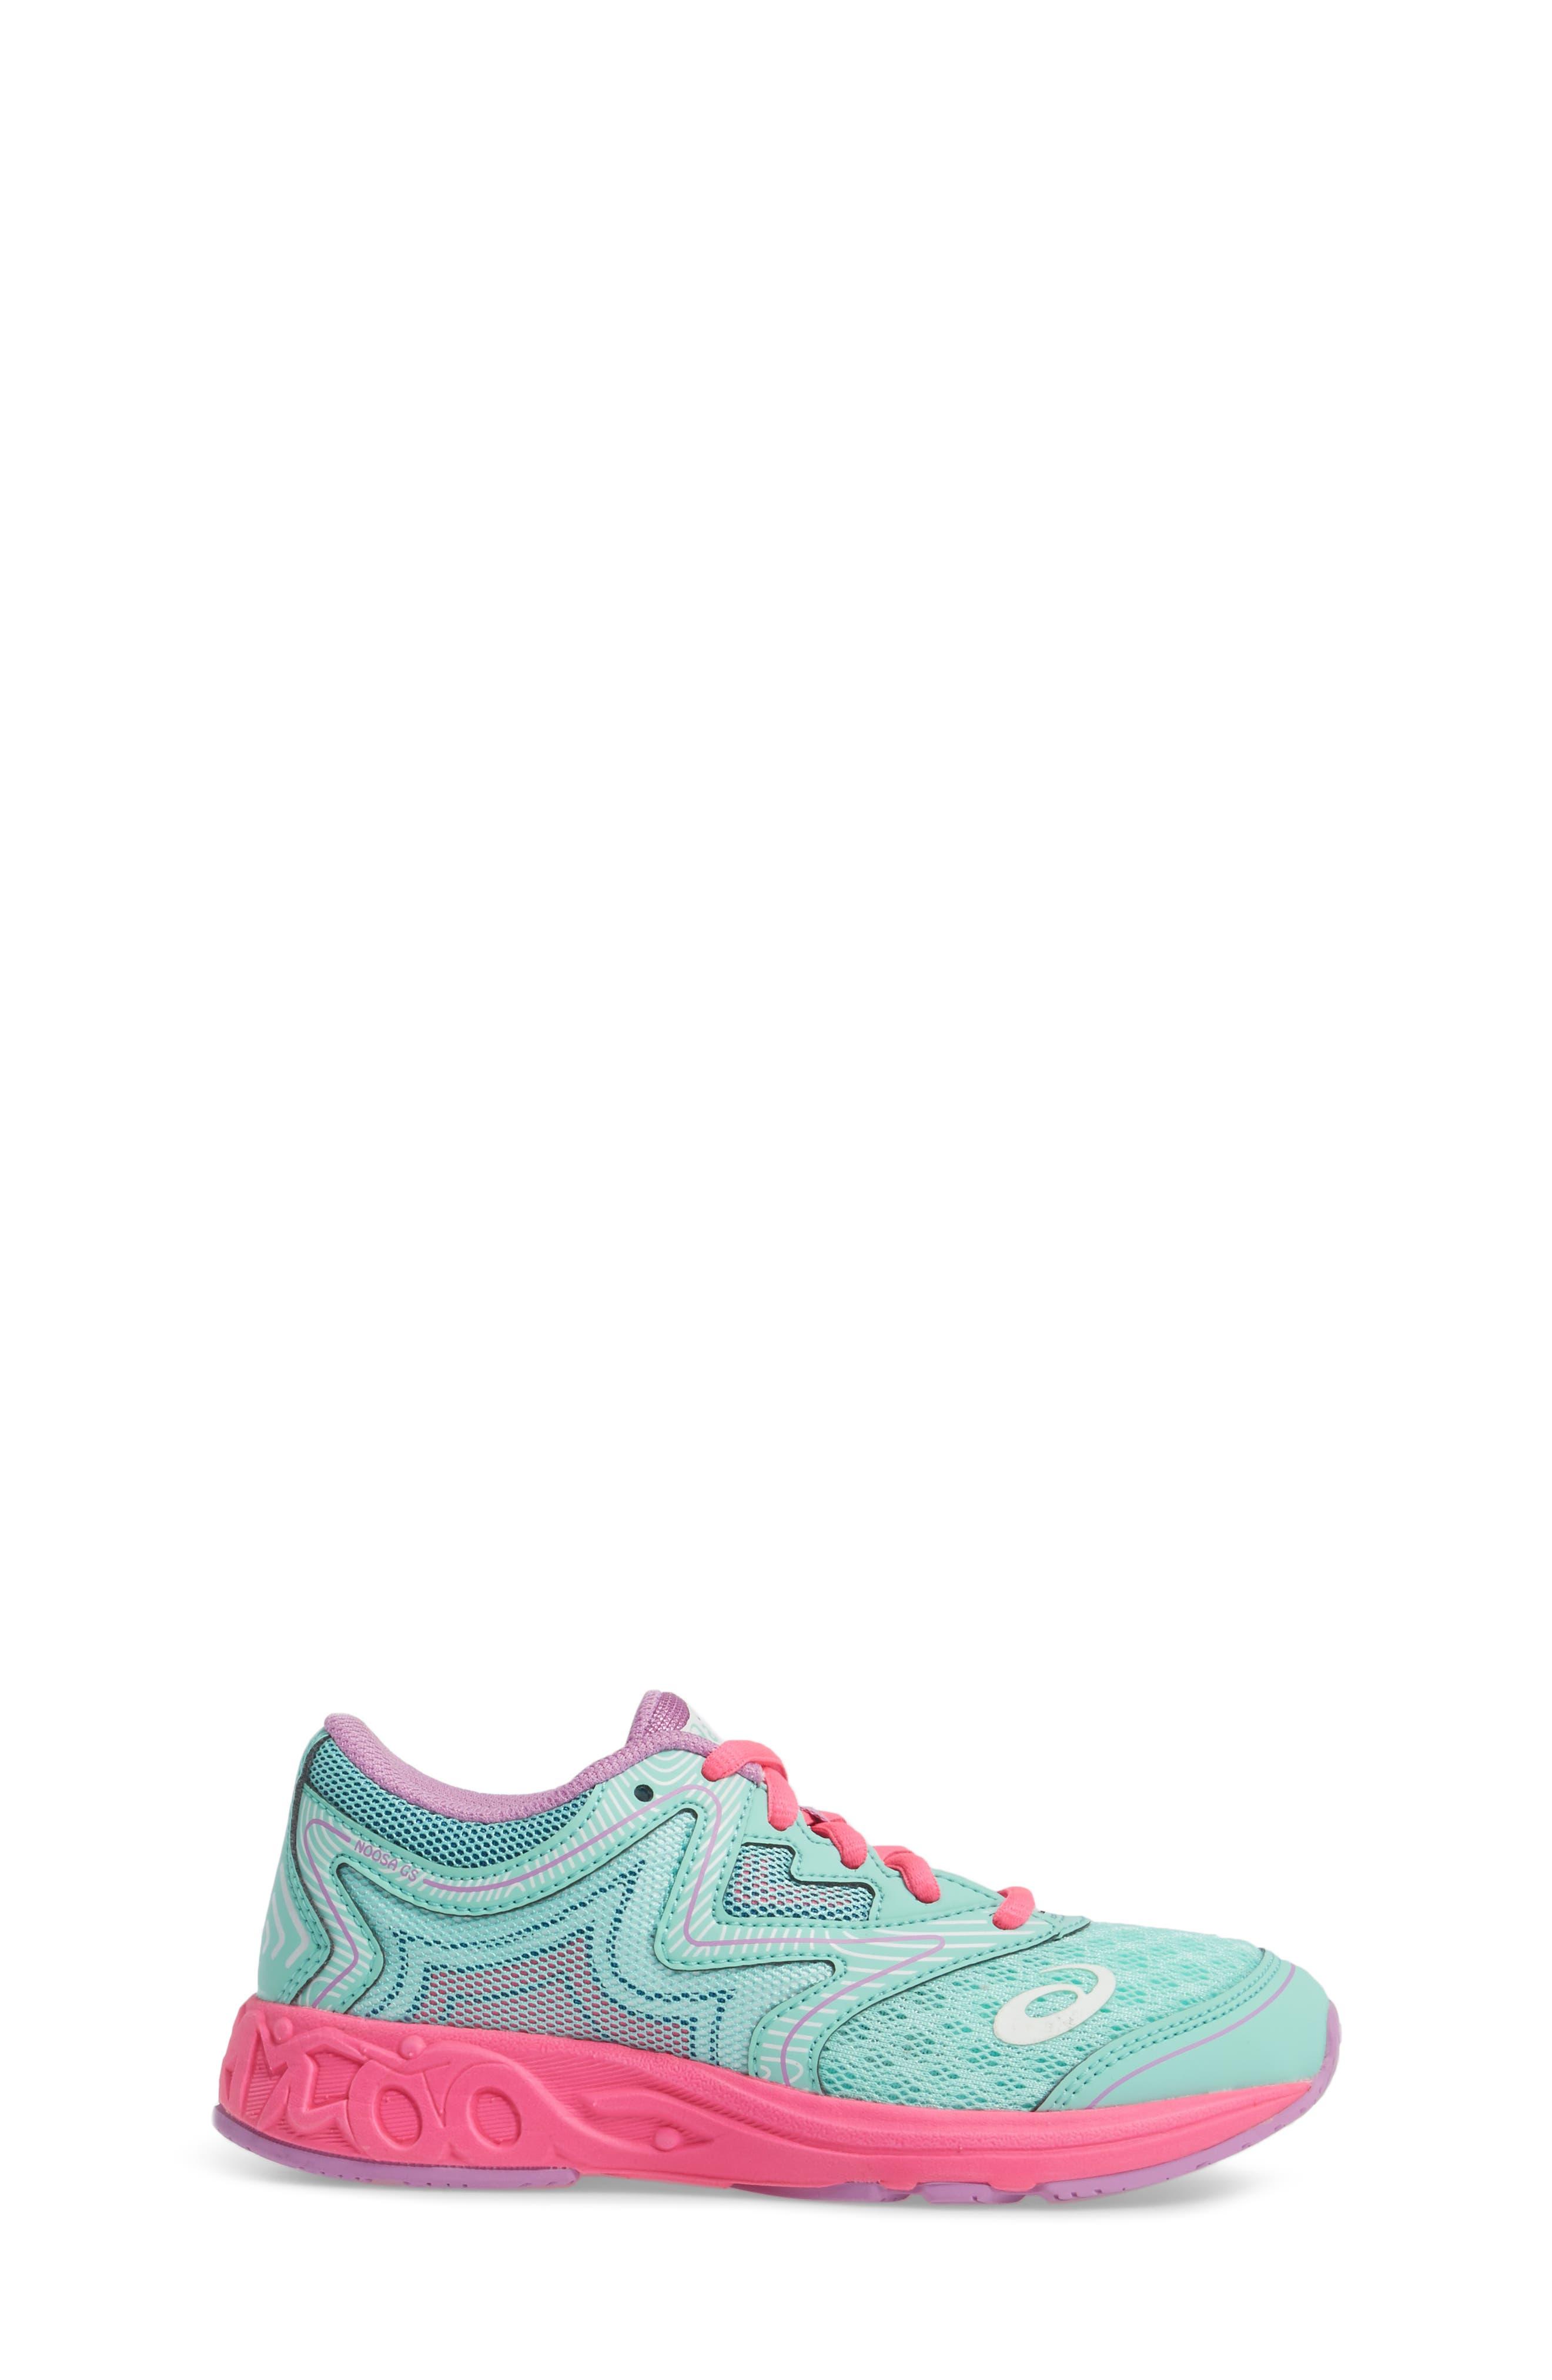 Noosa GS Sneaker,                             Alternate thumbnail 3, color,                             330